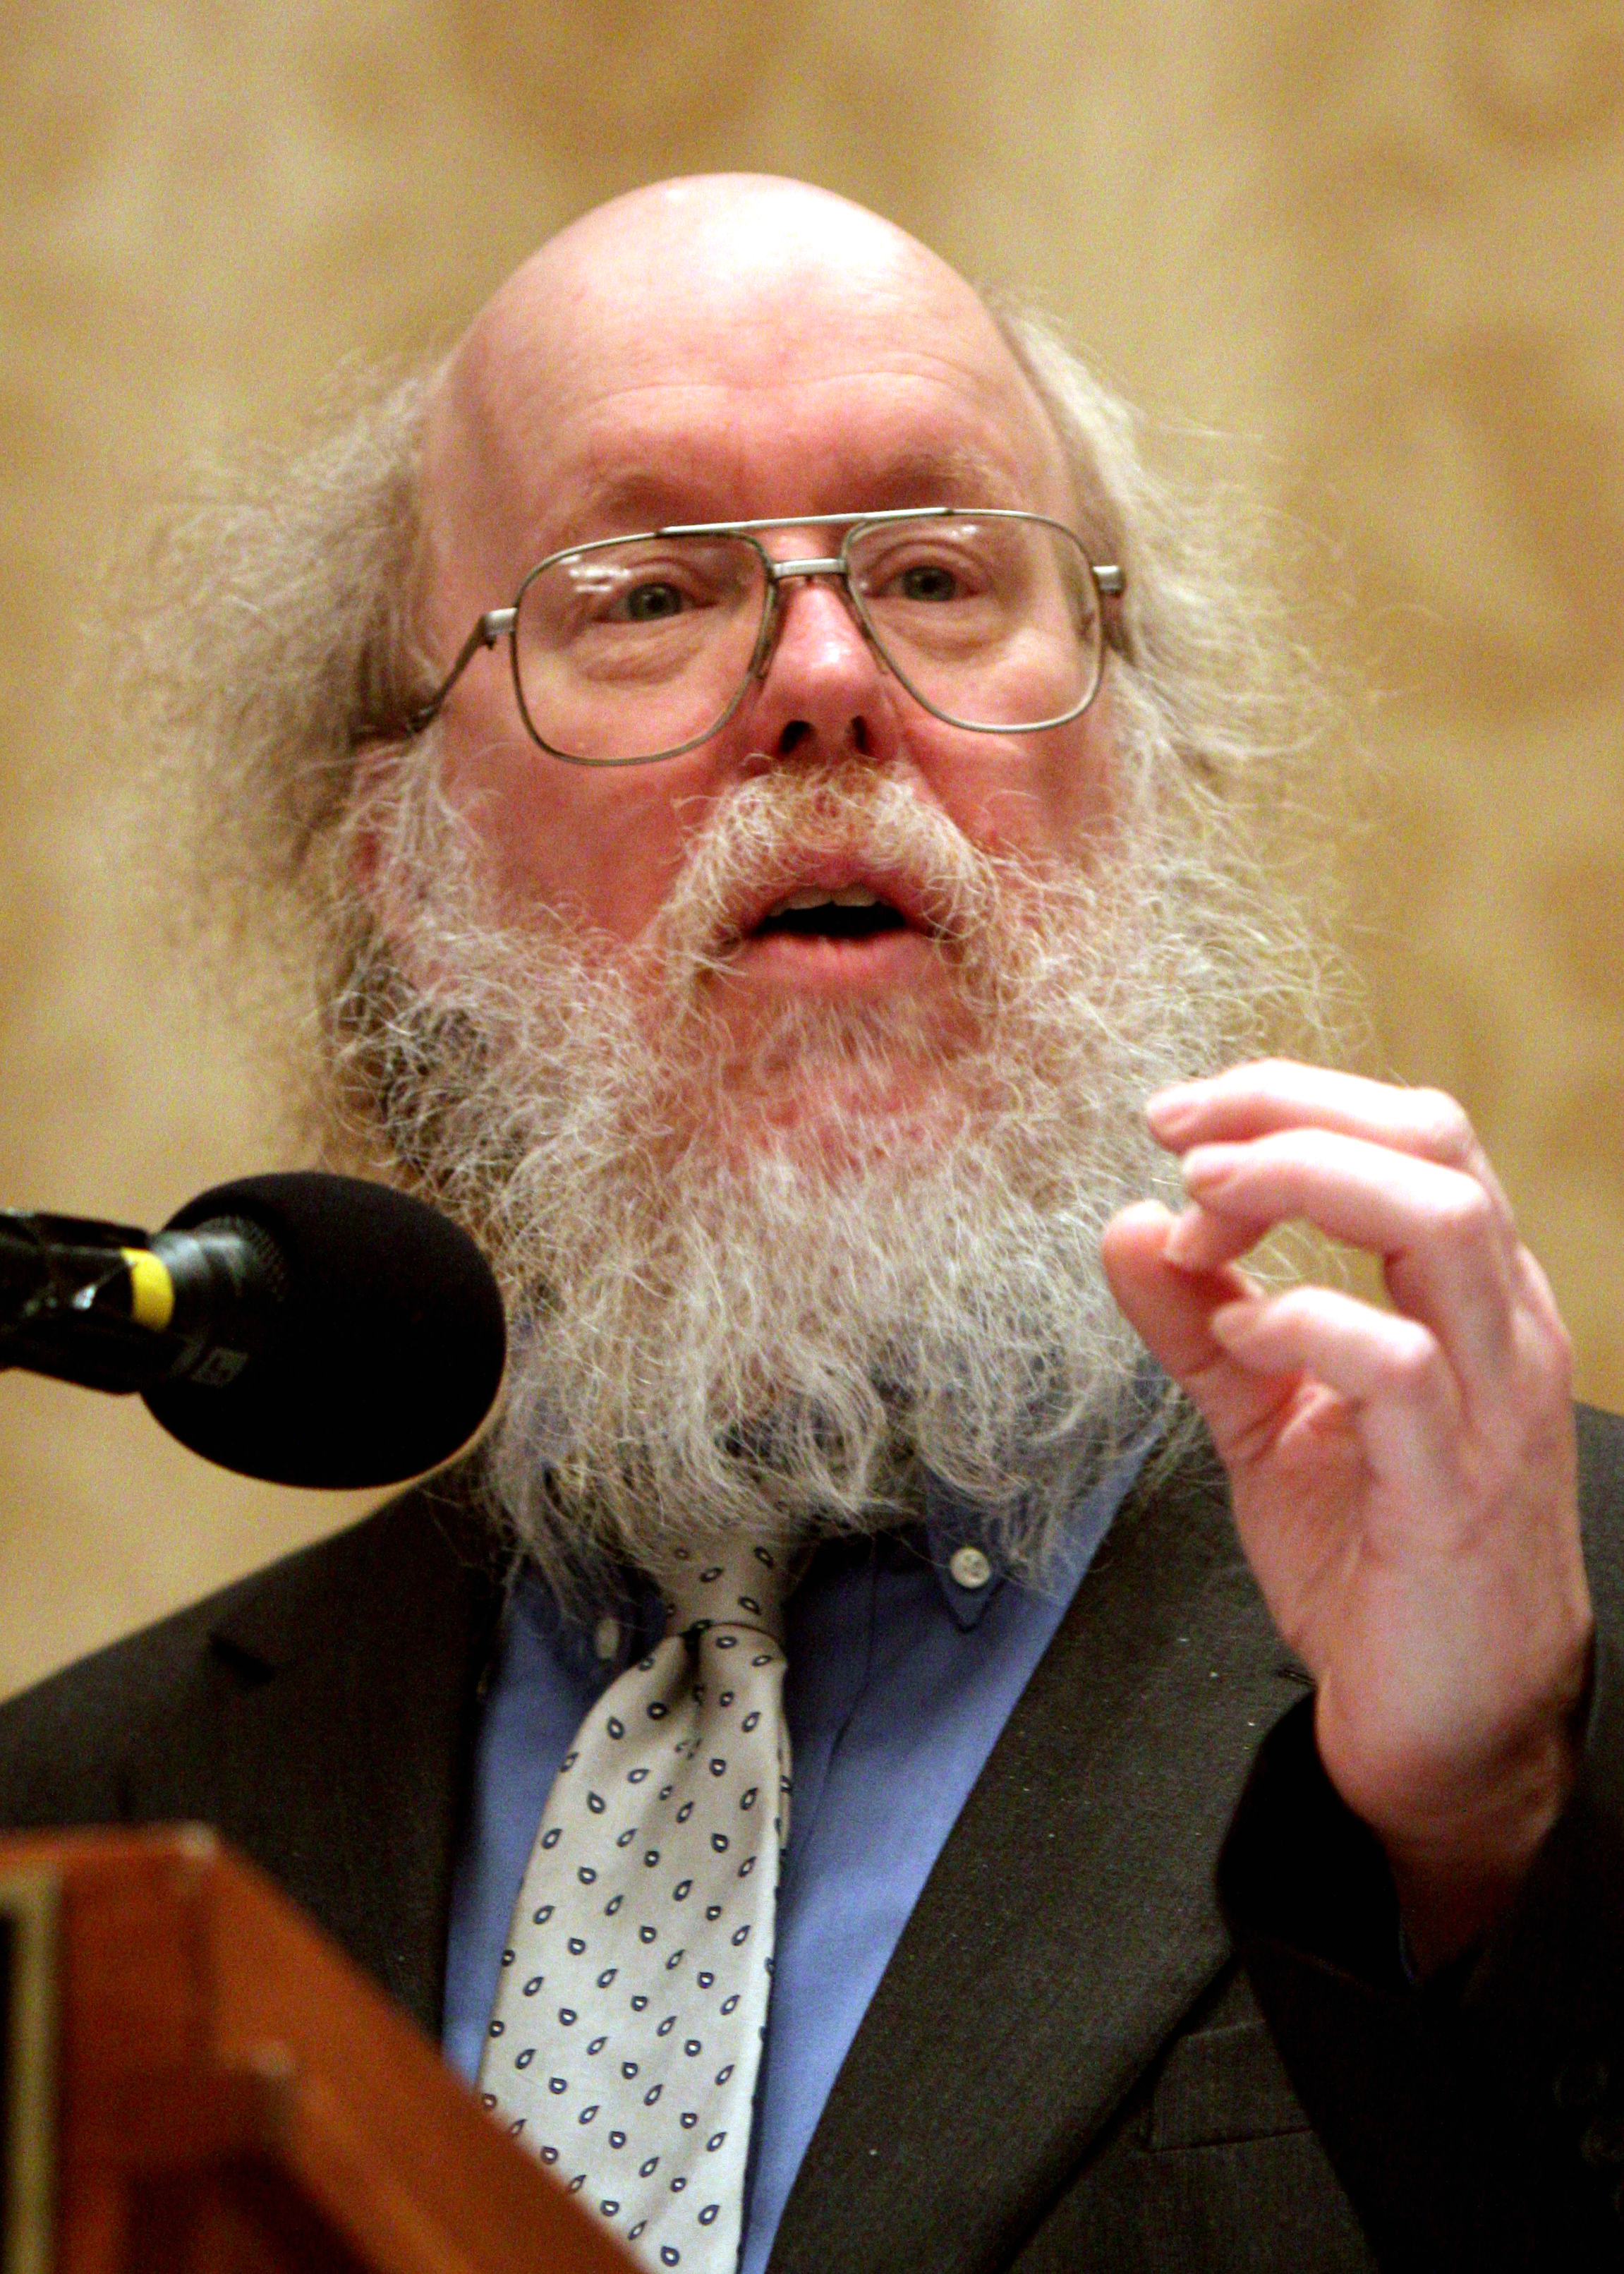 Bovard speaking in Washington, D.C. in 2011